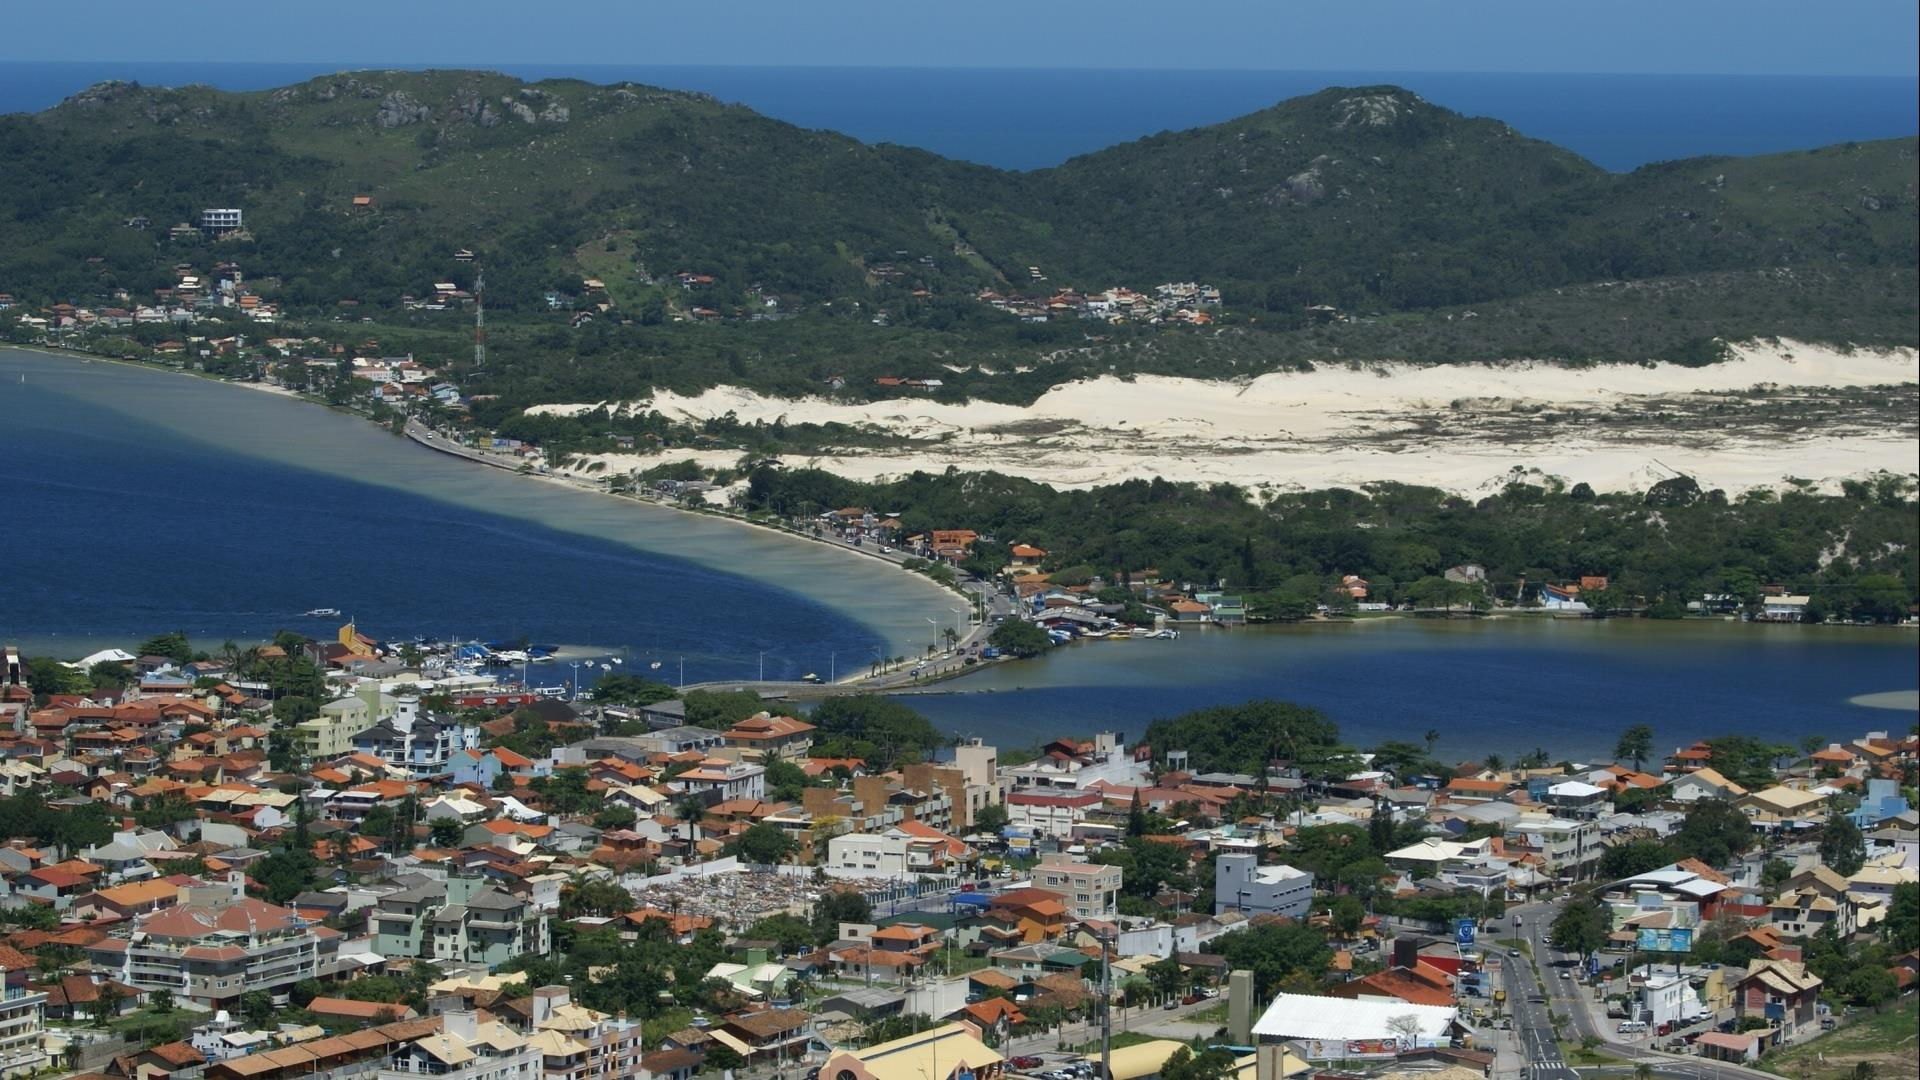 Brasilien Florianopolis: 14 Tage Reisebaustein - Sprachkurs in Florianopolis